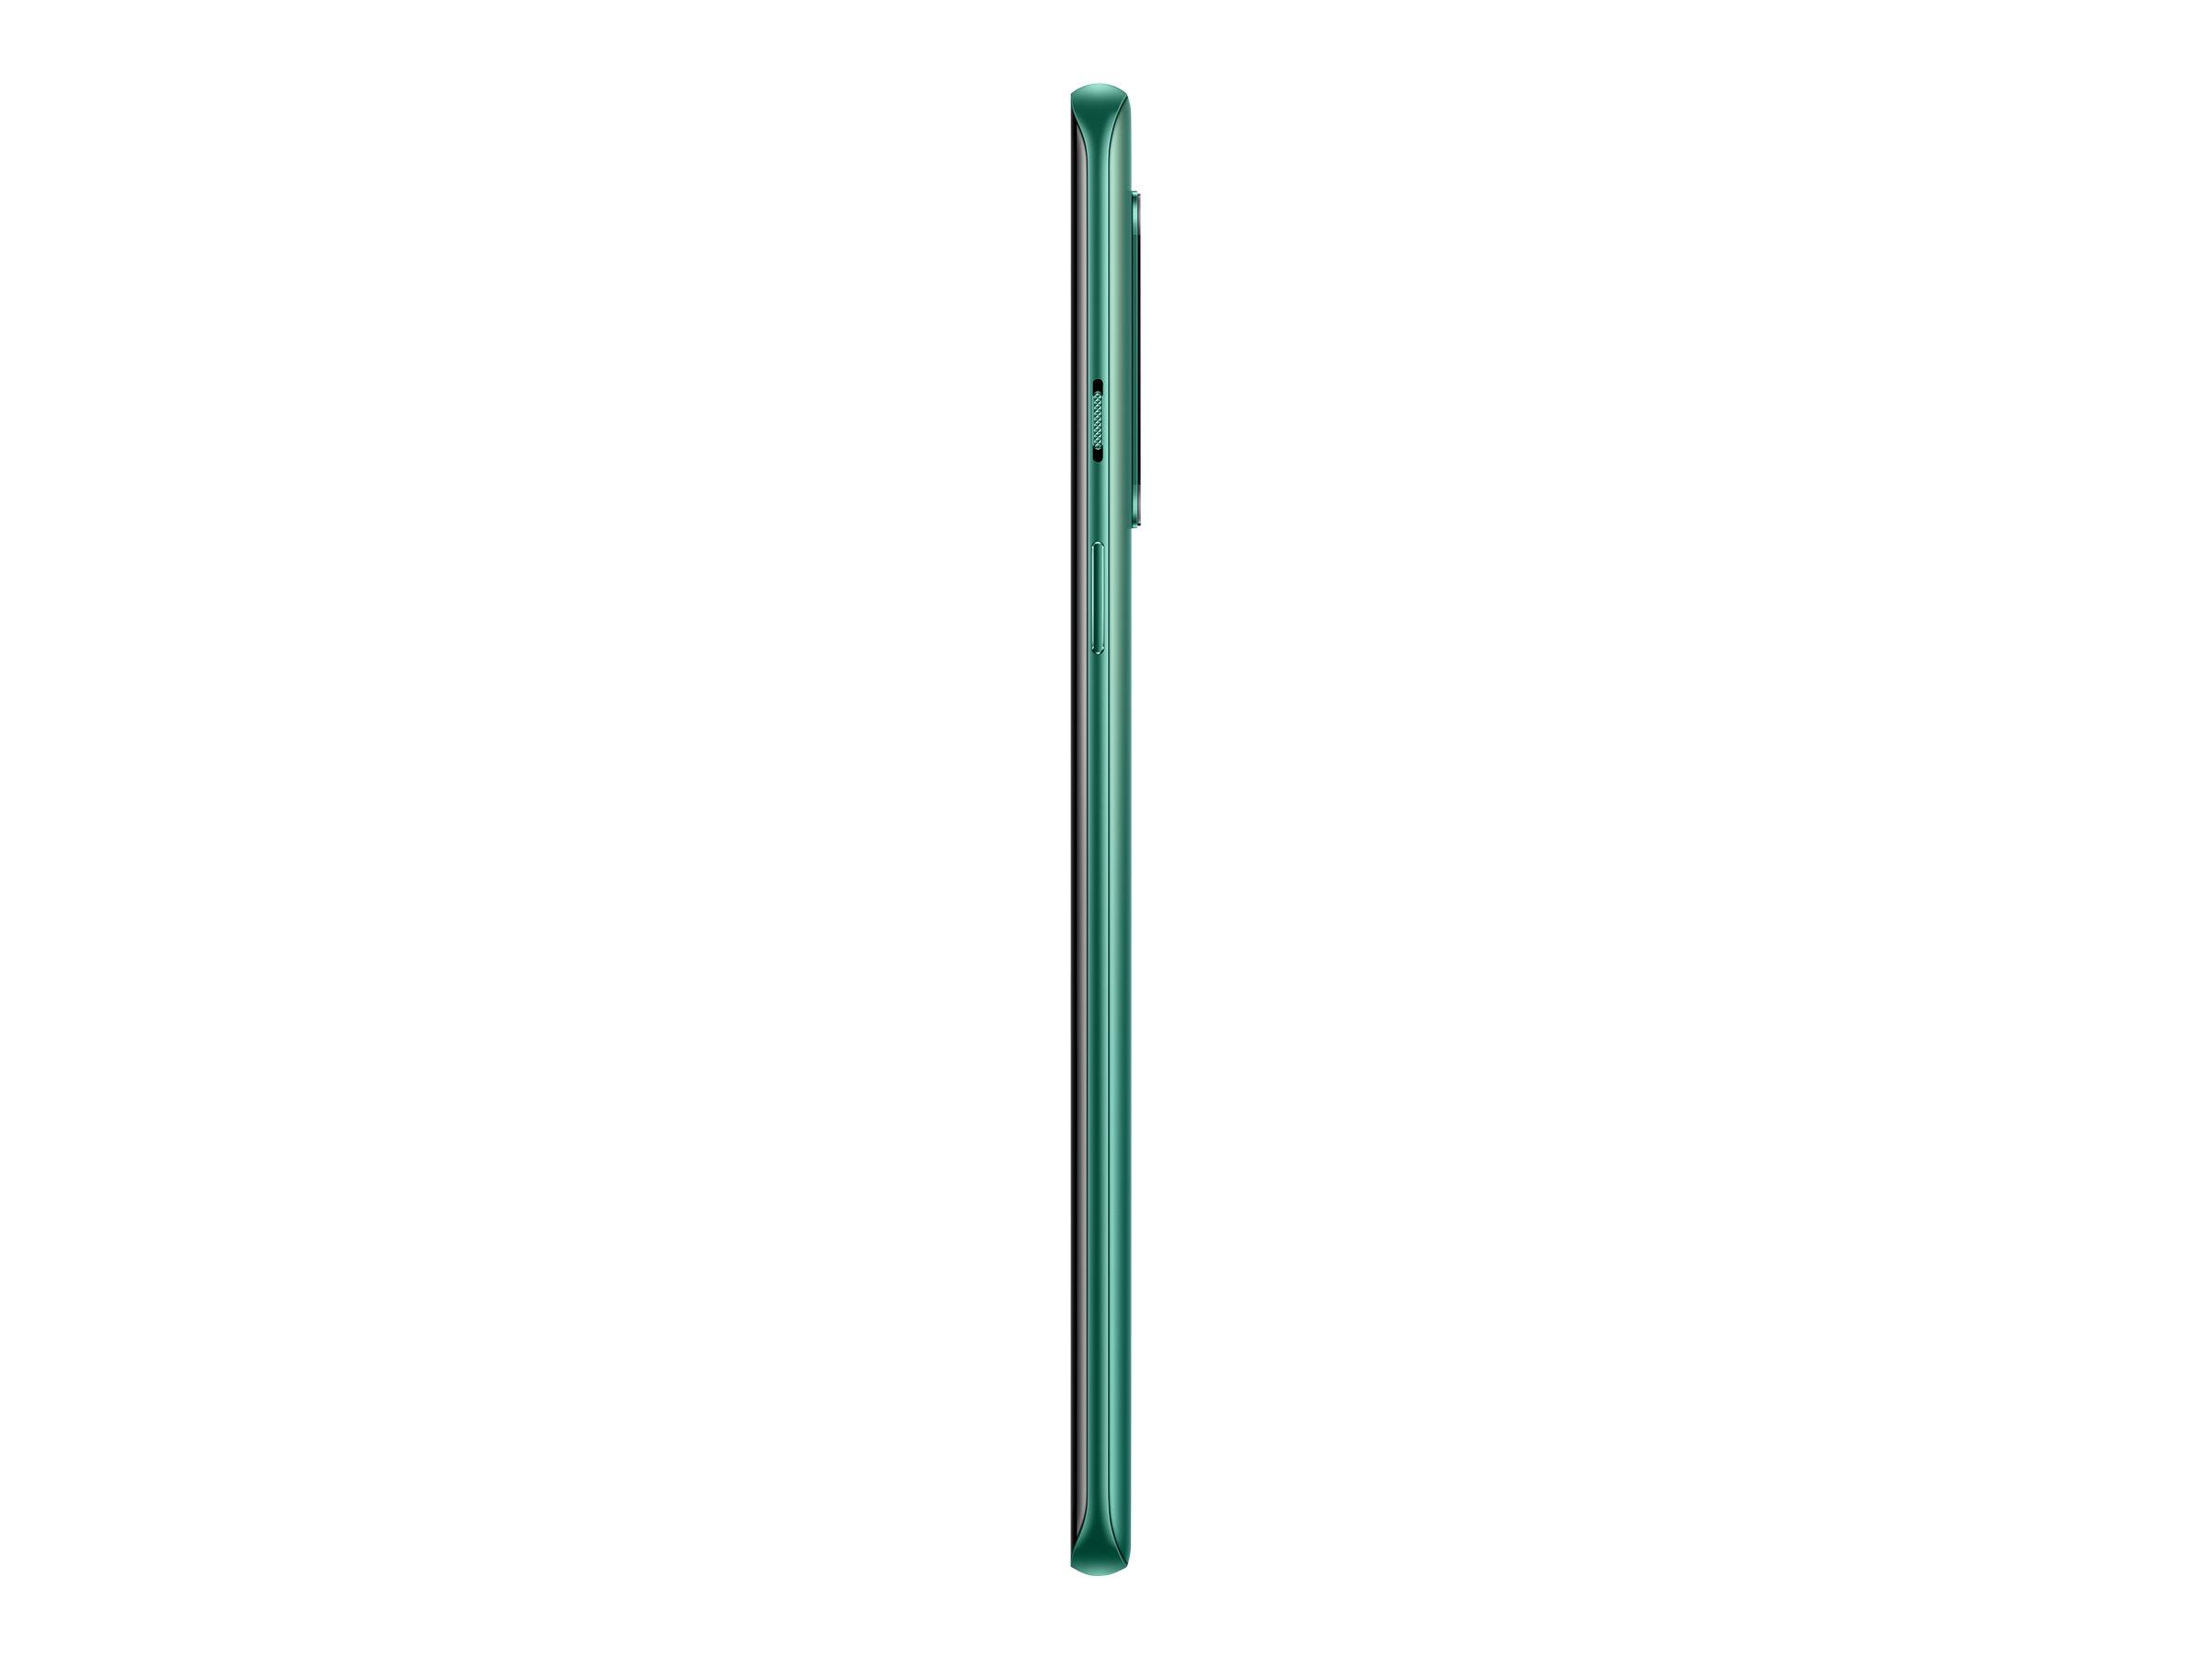 "OnePlus 8 - Smartphone - Dual-SIM - 5G NR - 256 GB - CDMA / GSM - 6.55"" - 2400 x 1080 Pixel (402 ppi (Pixel pro Zoll))"